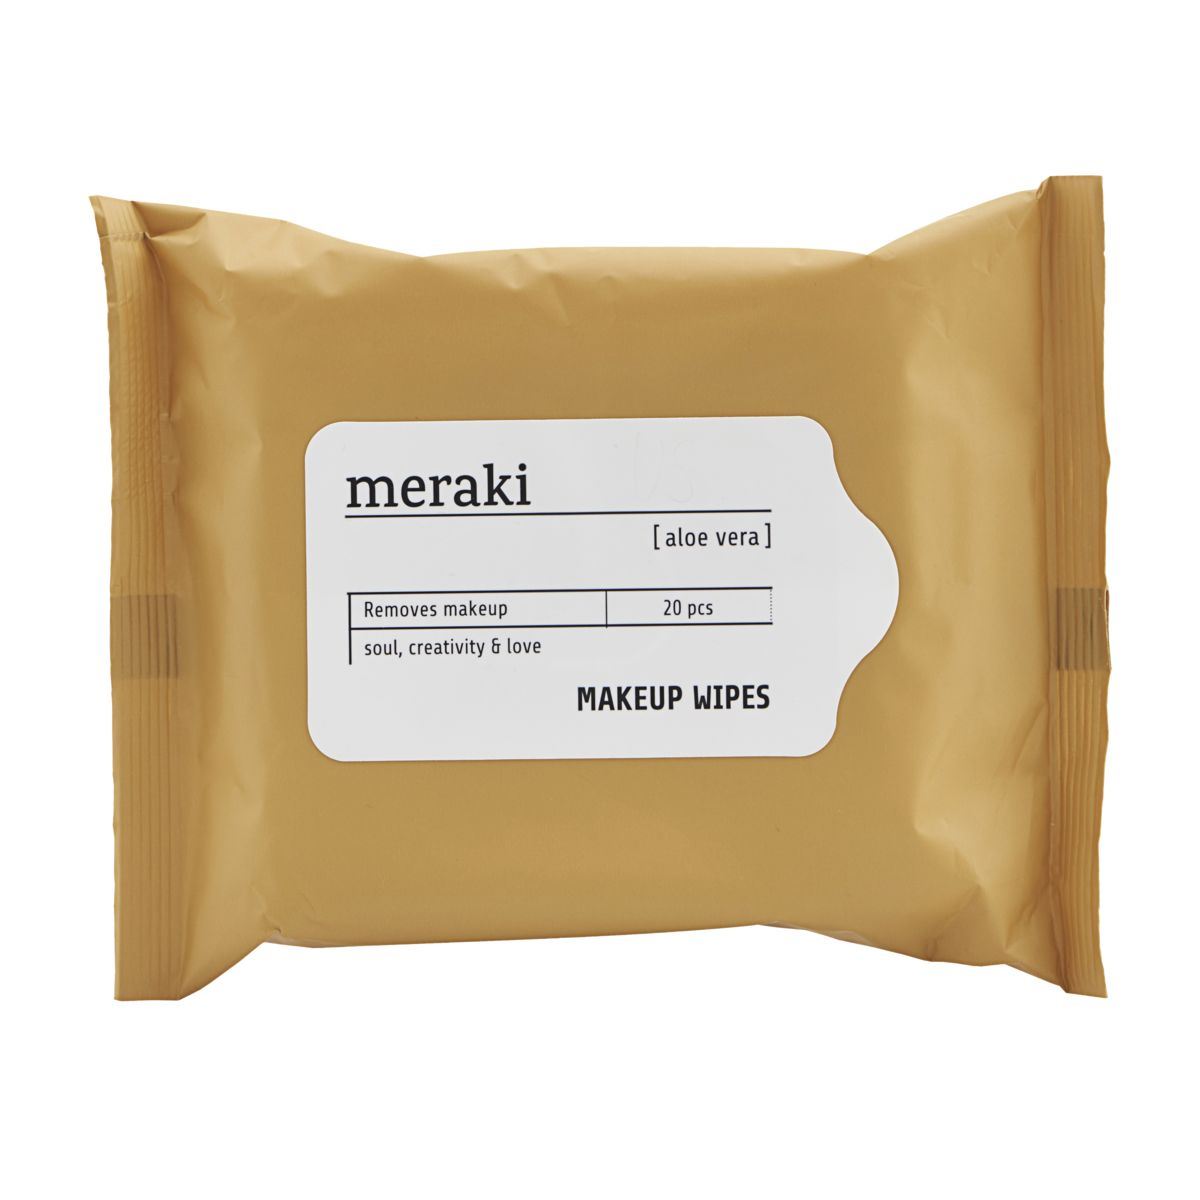 Meraki - Makeup wipes